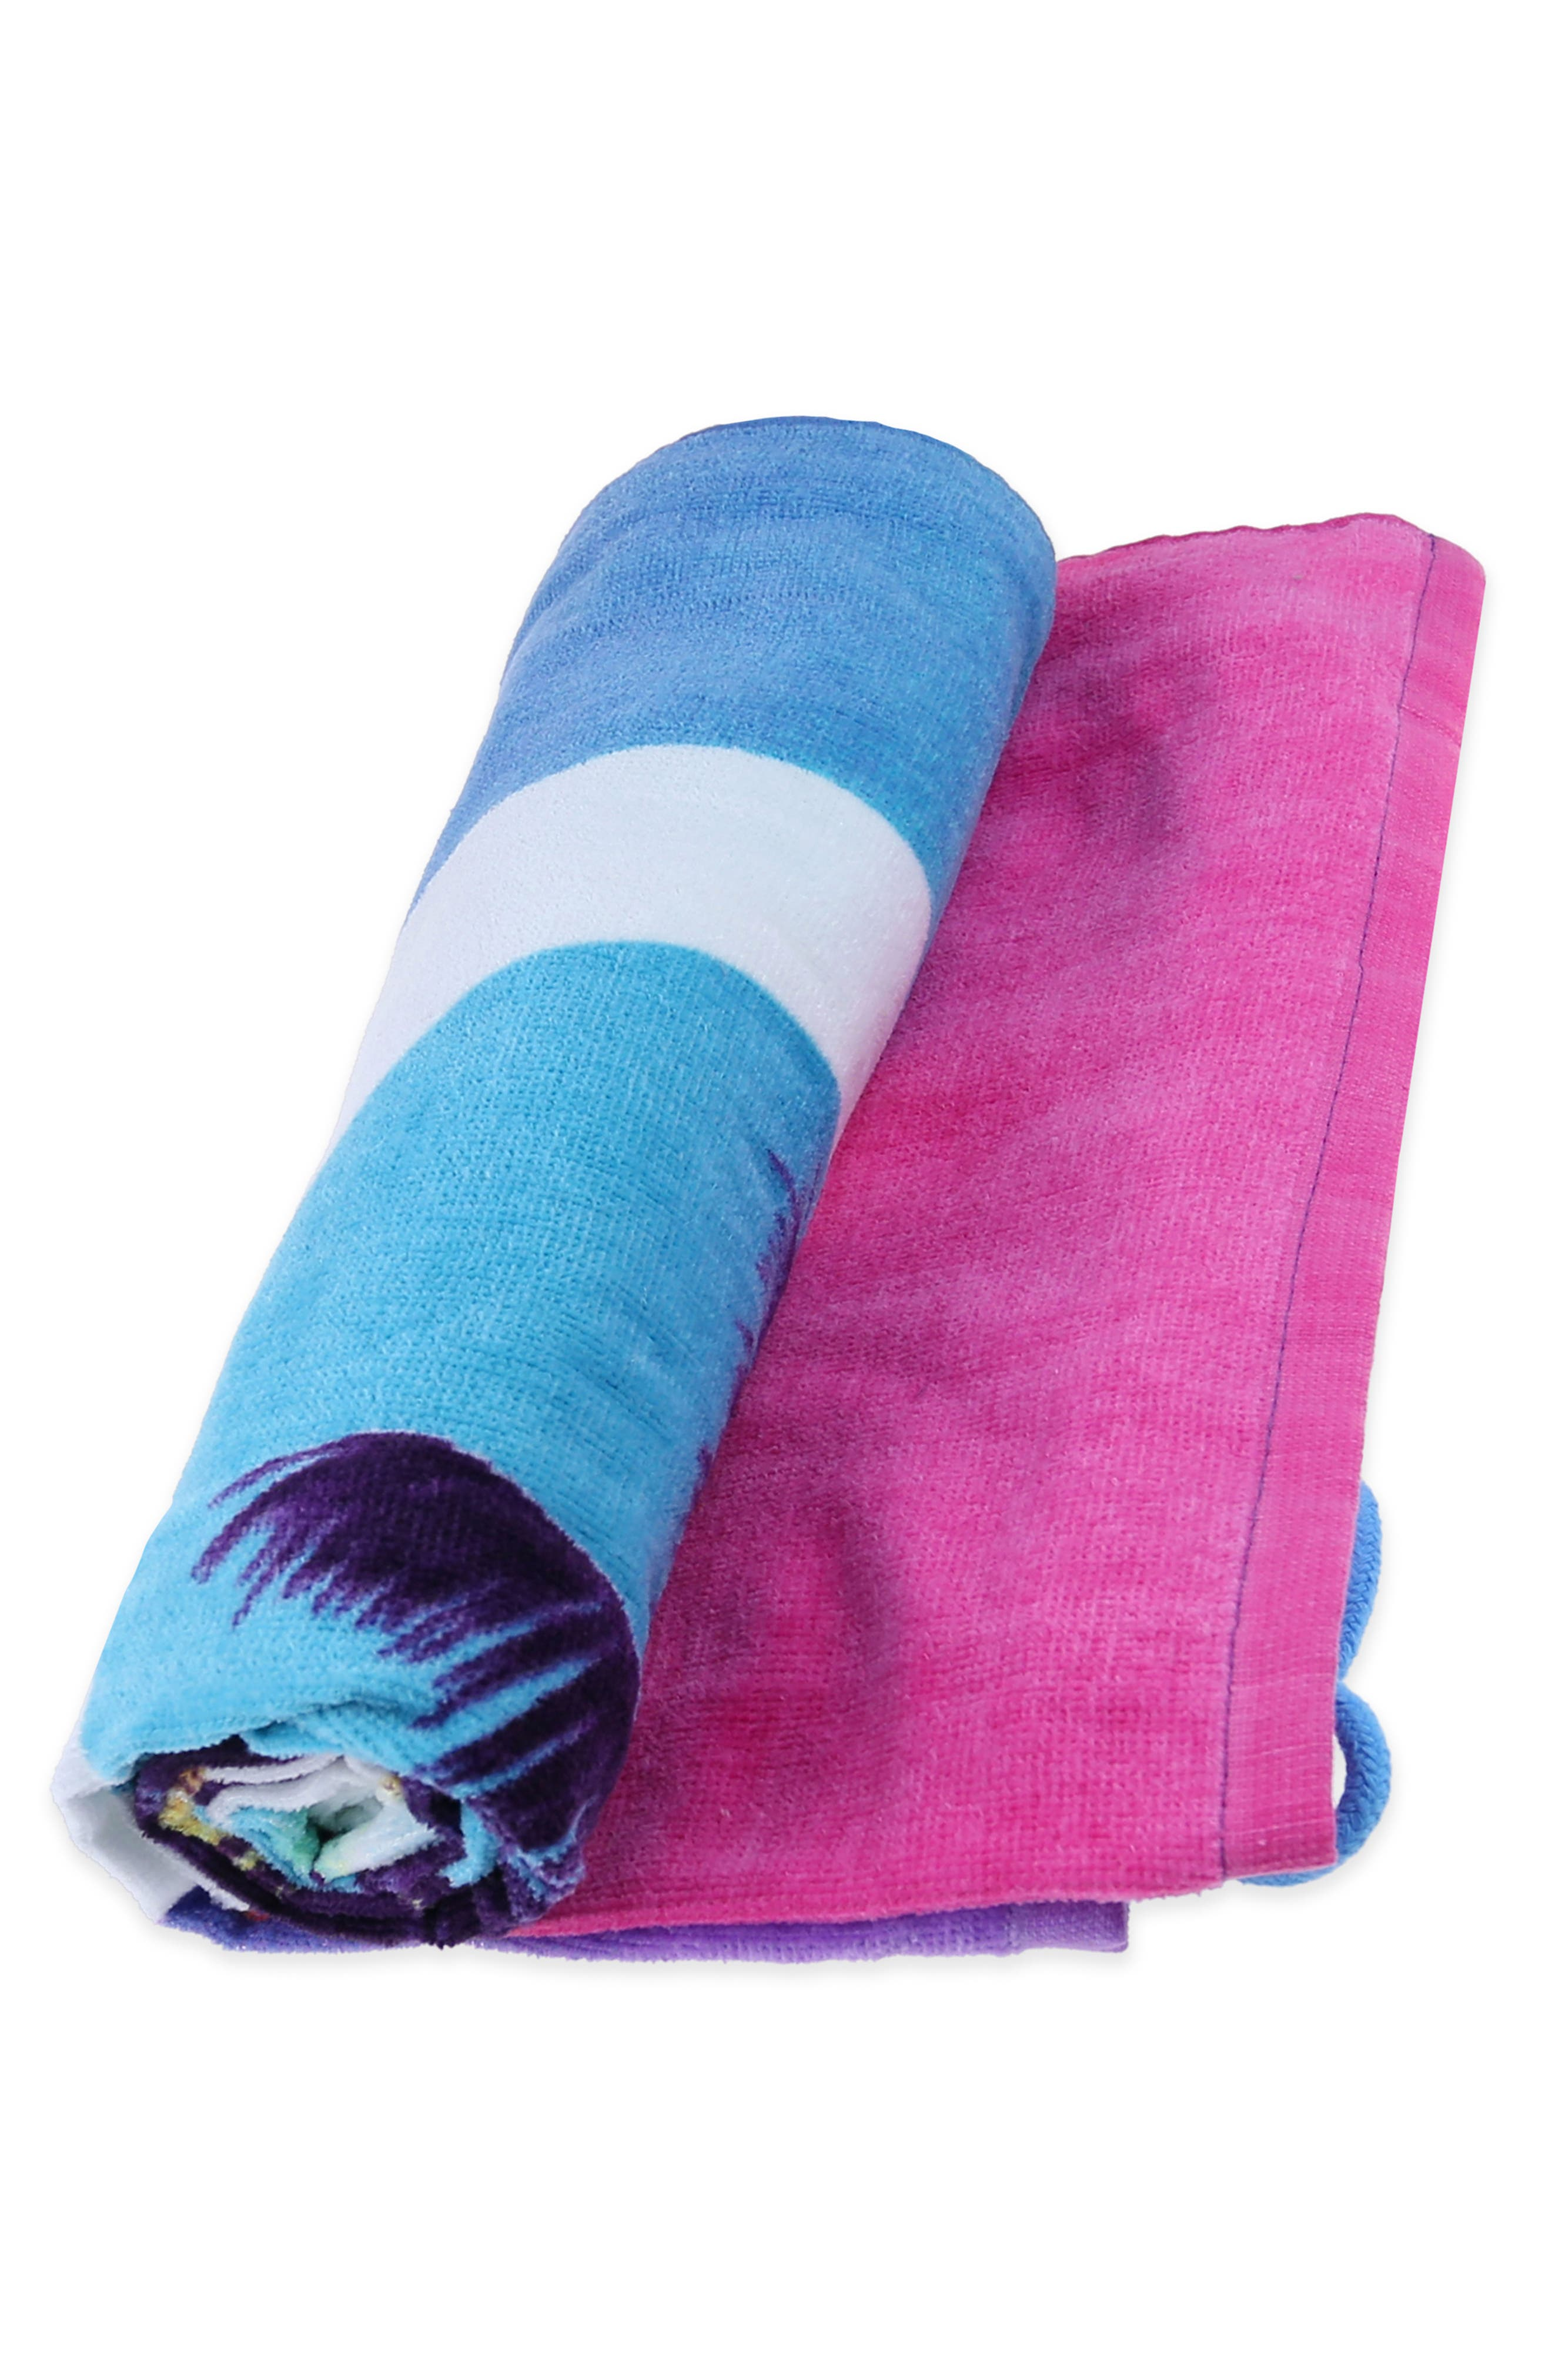 Heart Sunnies Towel Backpack,                             Alternate thumbnail 6, color,                             475